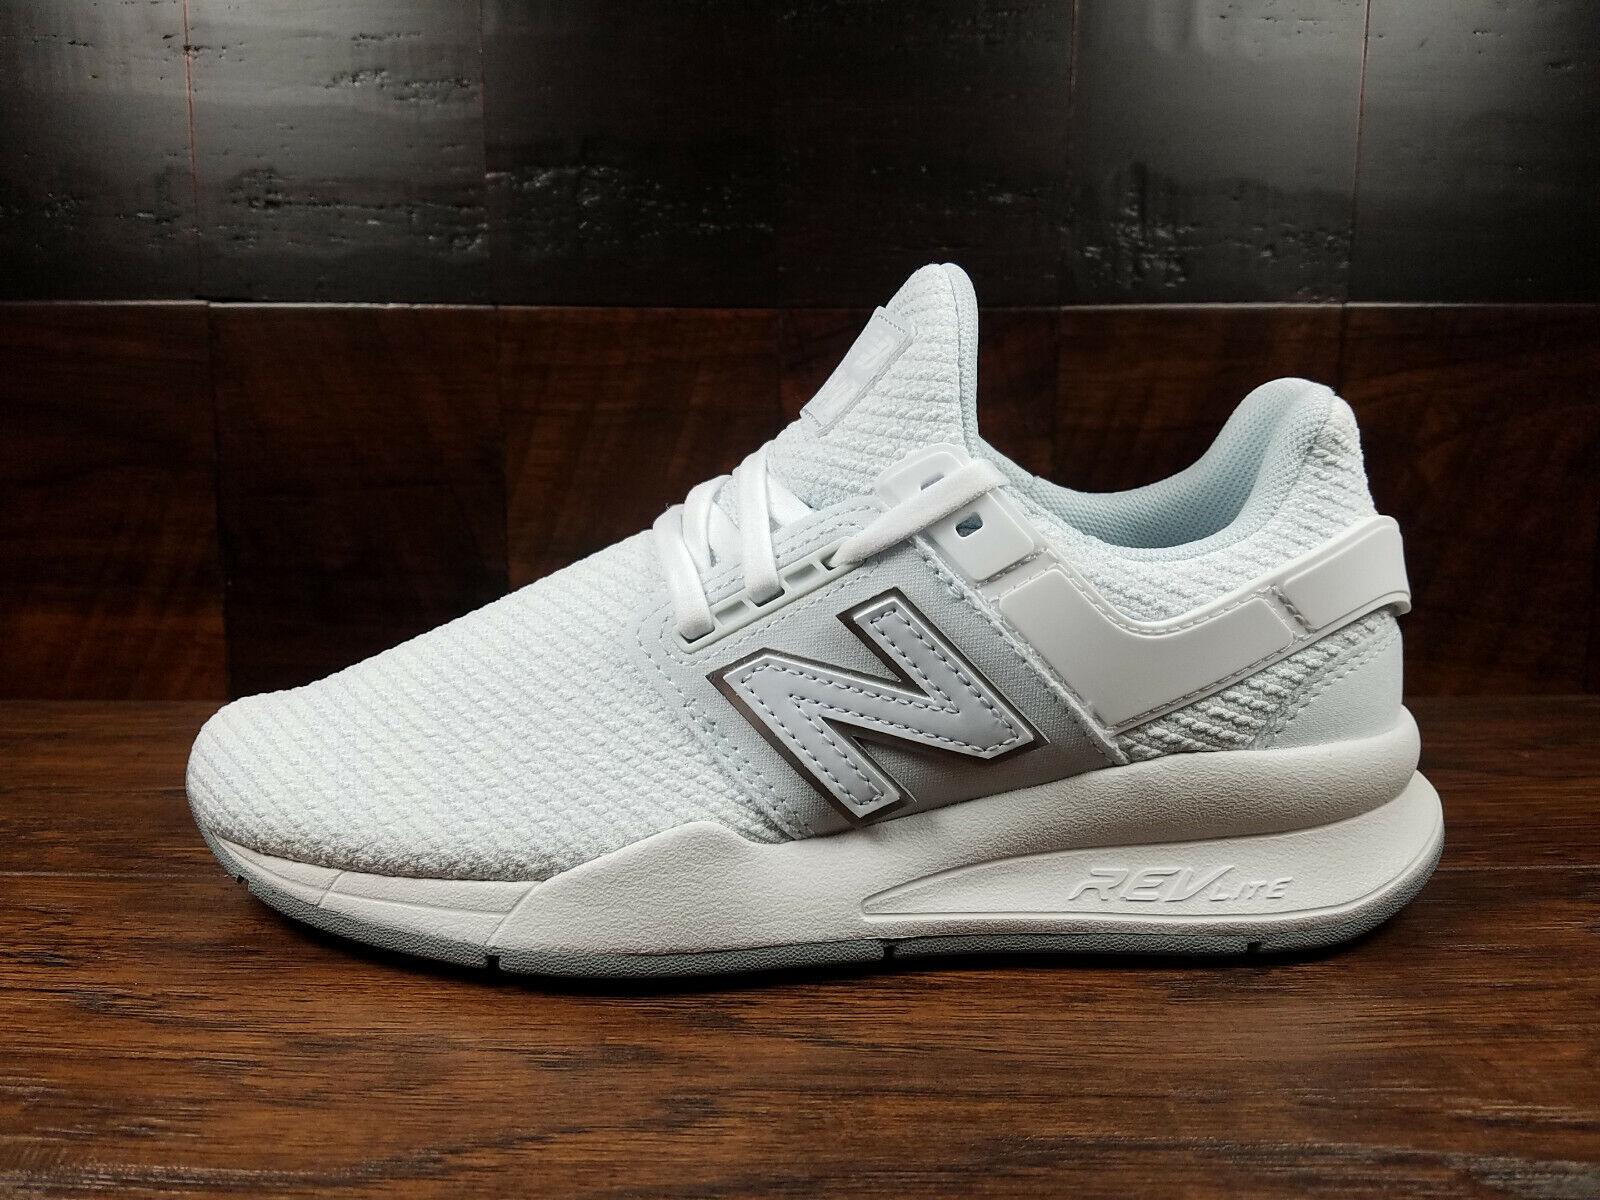 New Balance 247 Sport Shoe Women's Shoes in Platinum Sky